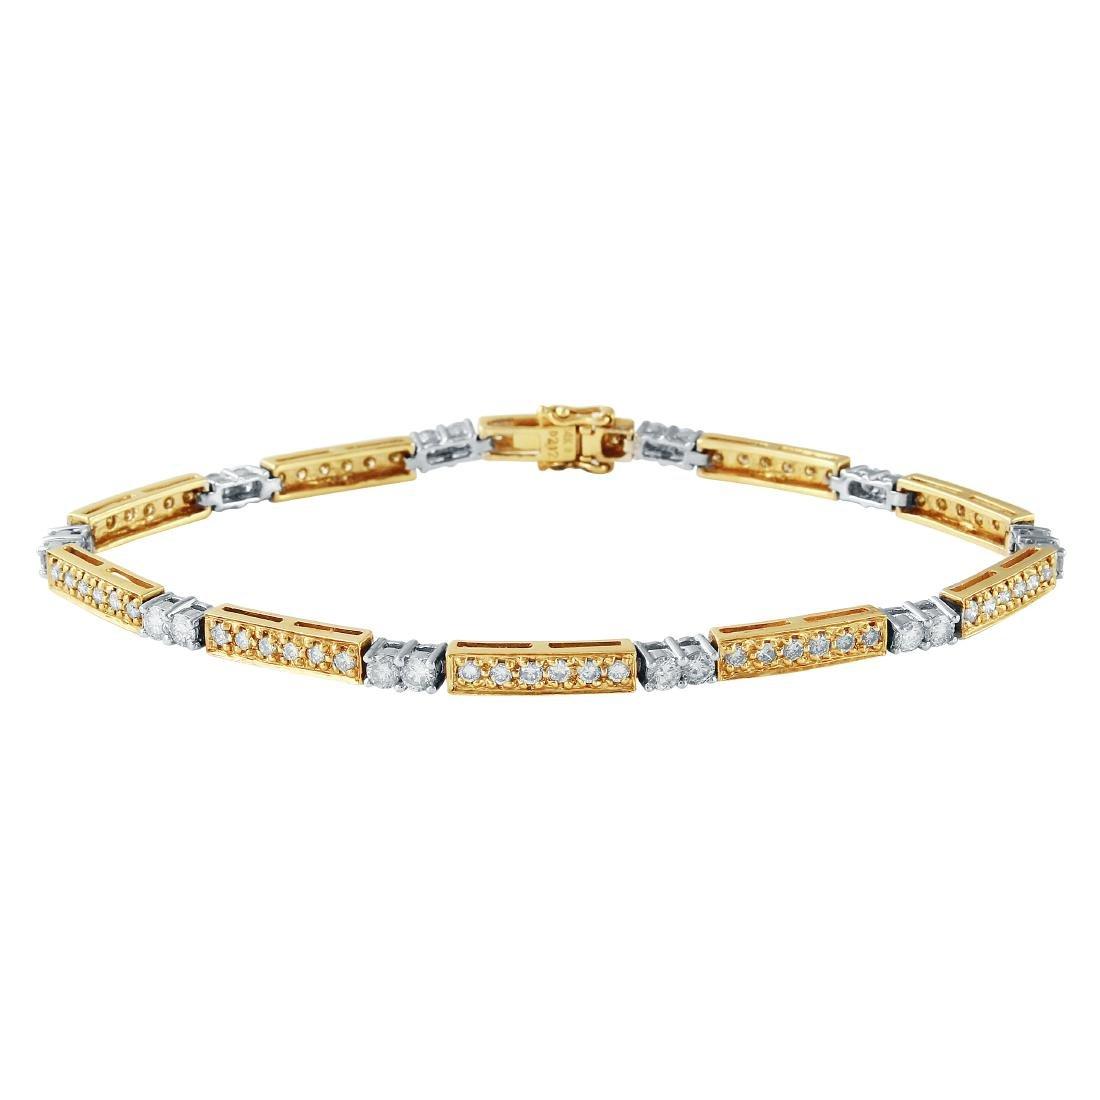 2.12 CTW 14K Two Tone Gold Ladies Bracelet